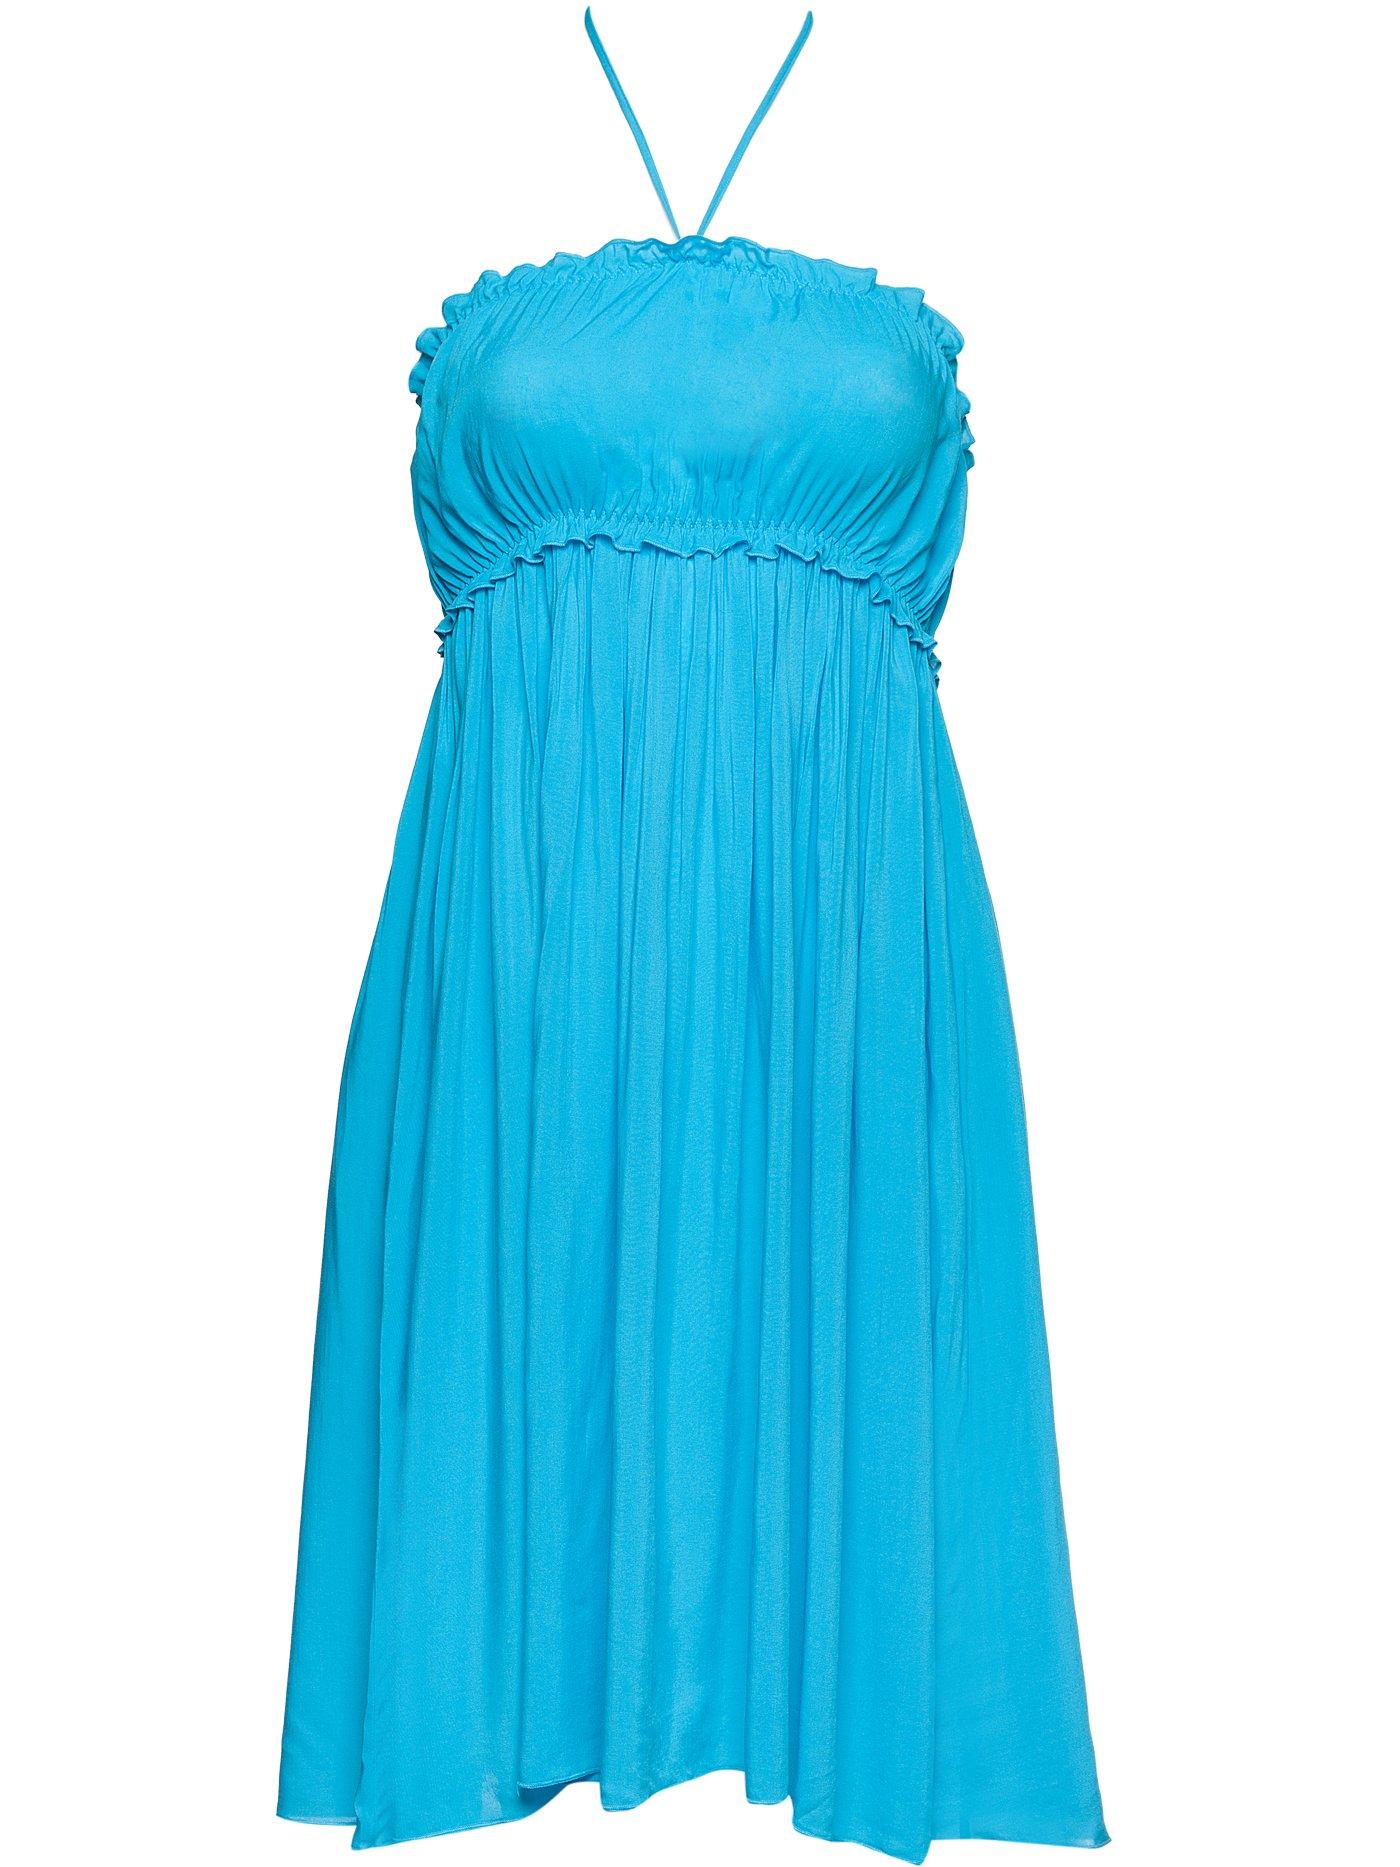 Платье vendetta bikini cocktailБюстье<br>платье<br><br>Цвет: Голубой<br>Декор: Без декора<br>Стилистика: Без стилистики<br>Направление: Бюстье<br>Пол: Женский<br>Материал: 100%ВИ<br>Размер: 1